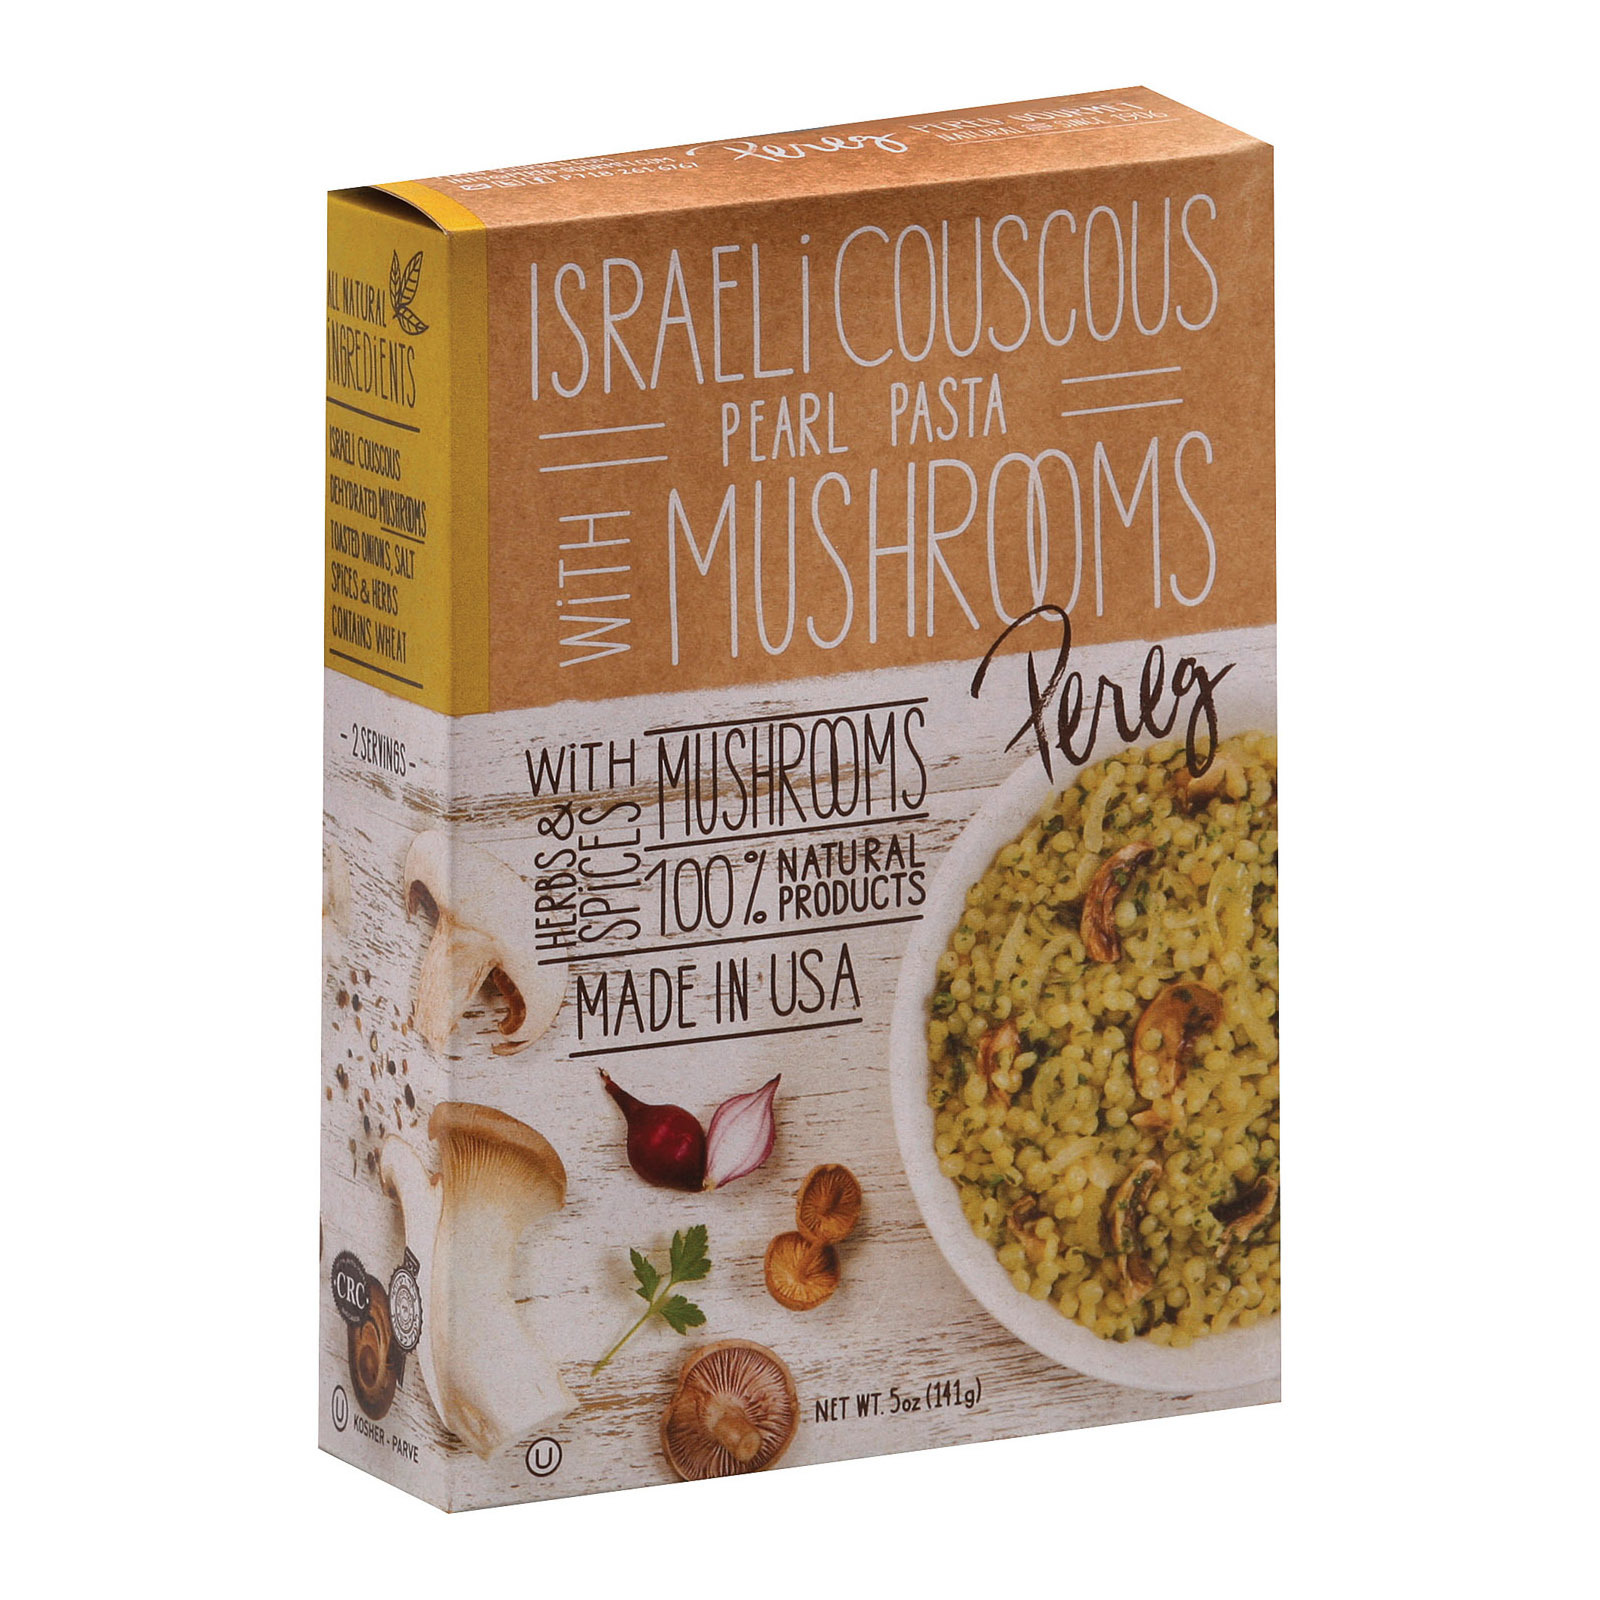 Pereg Israeli Couscous with Mushrooms - Case of 6 - 5 oz.